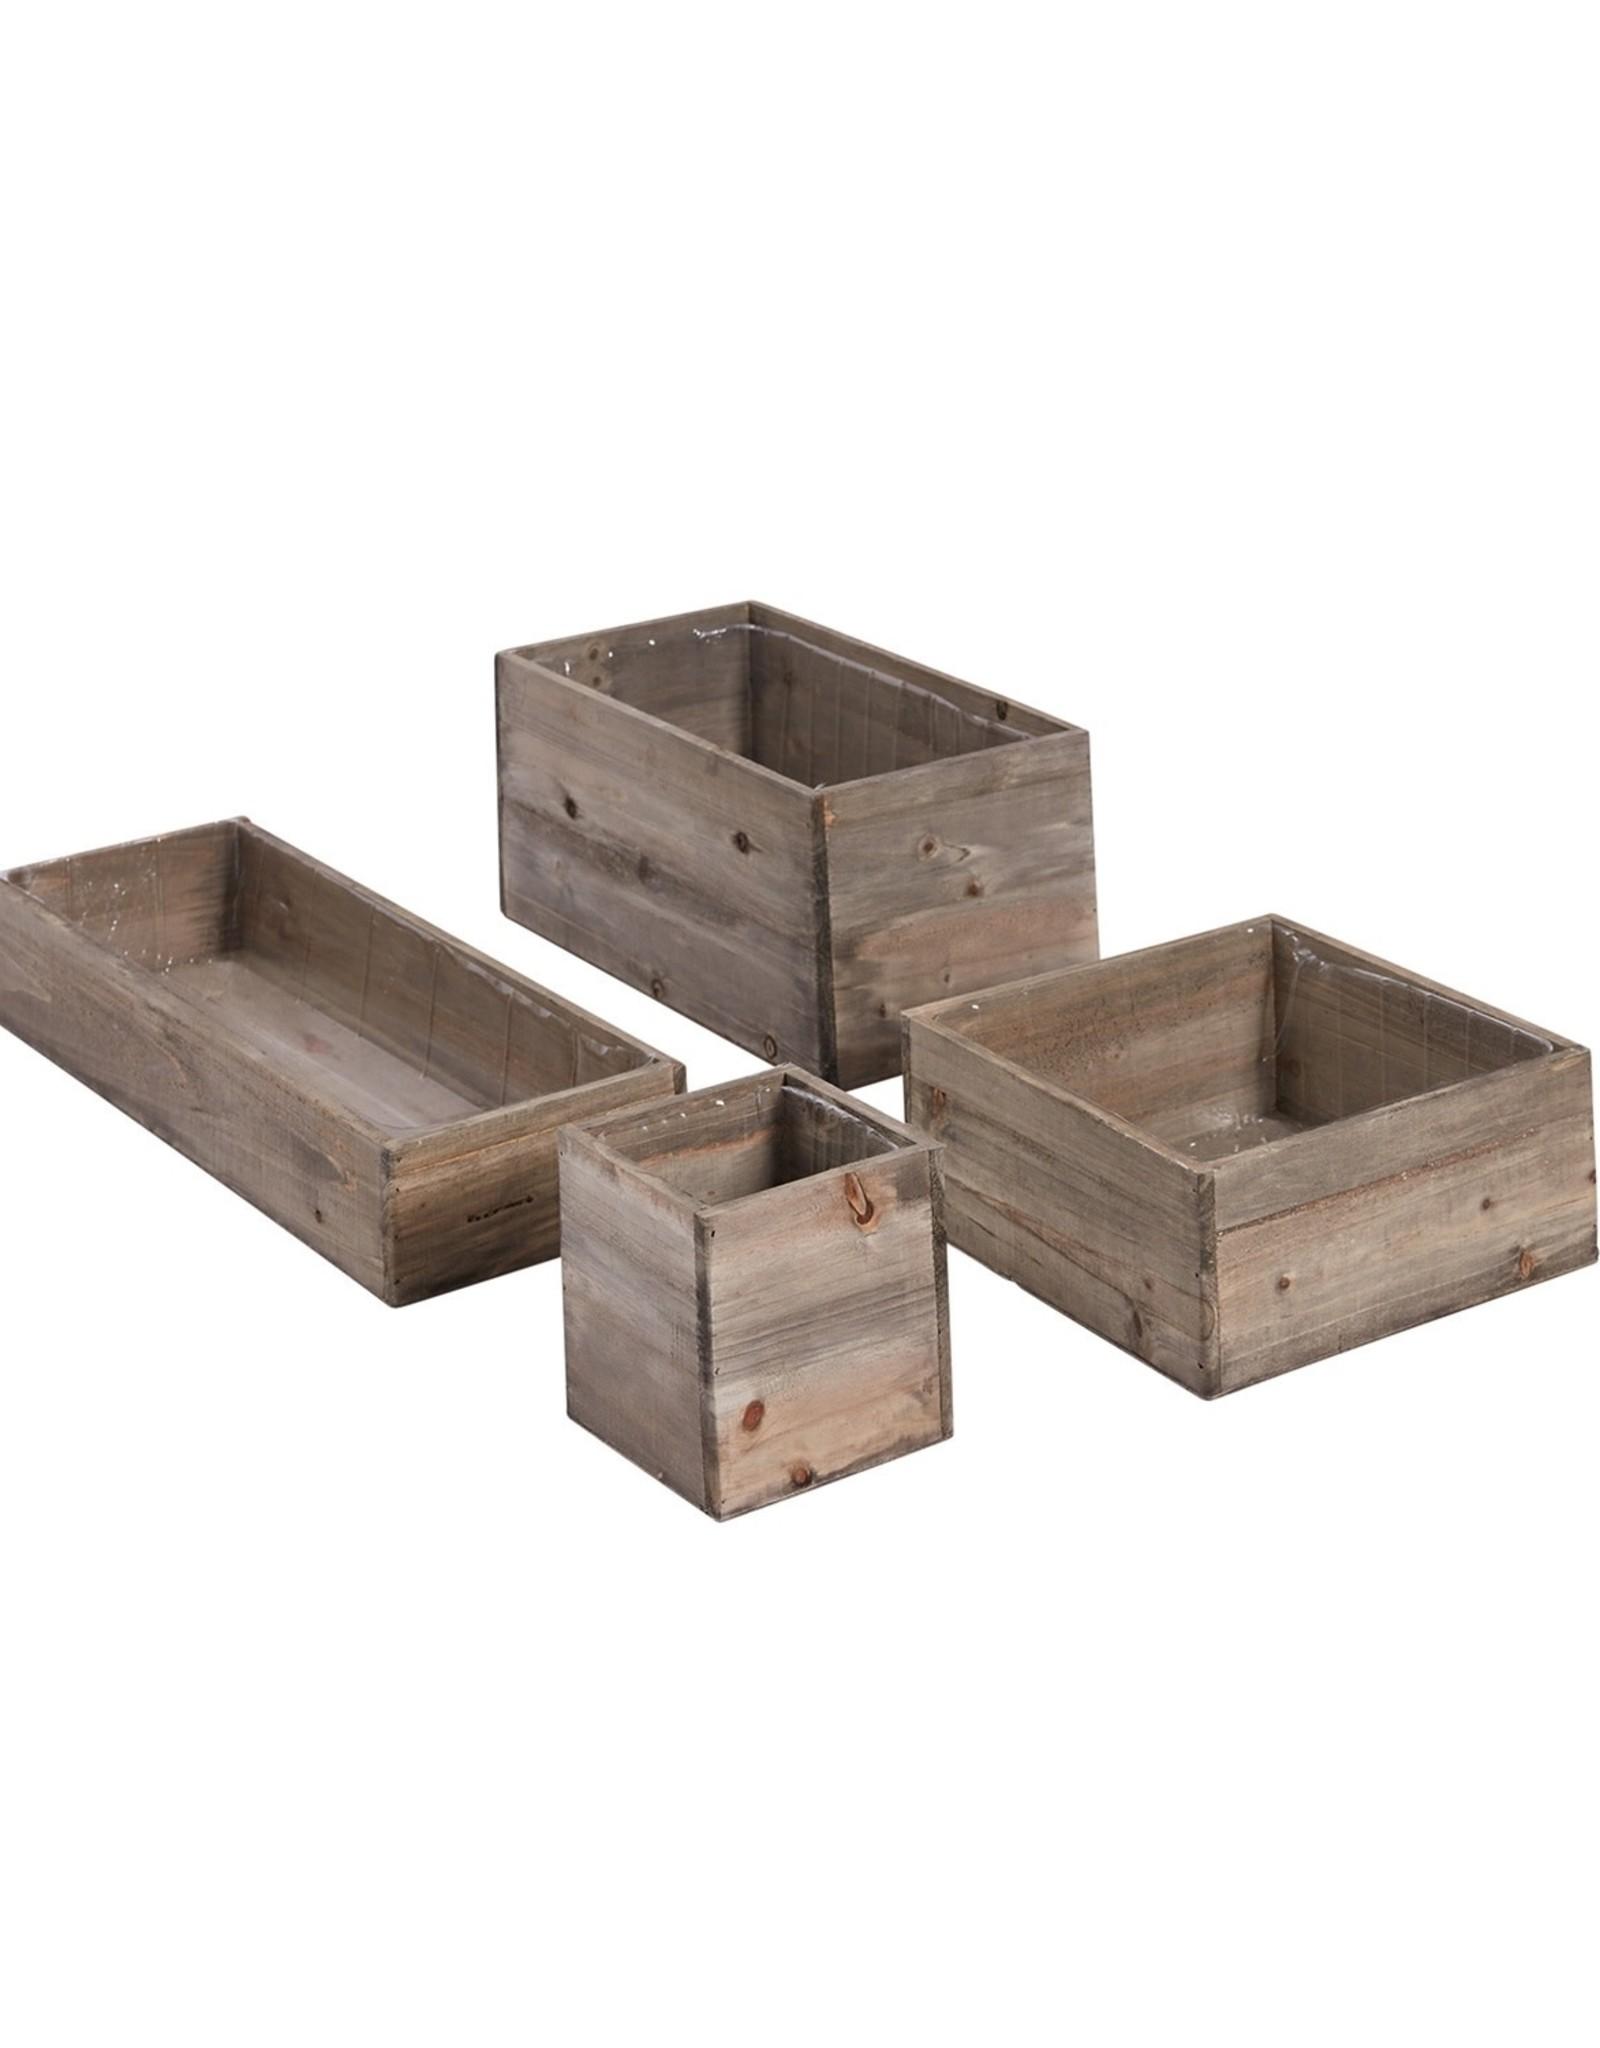 WOODLAND PLANTER BOX